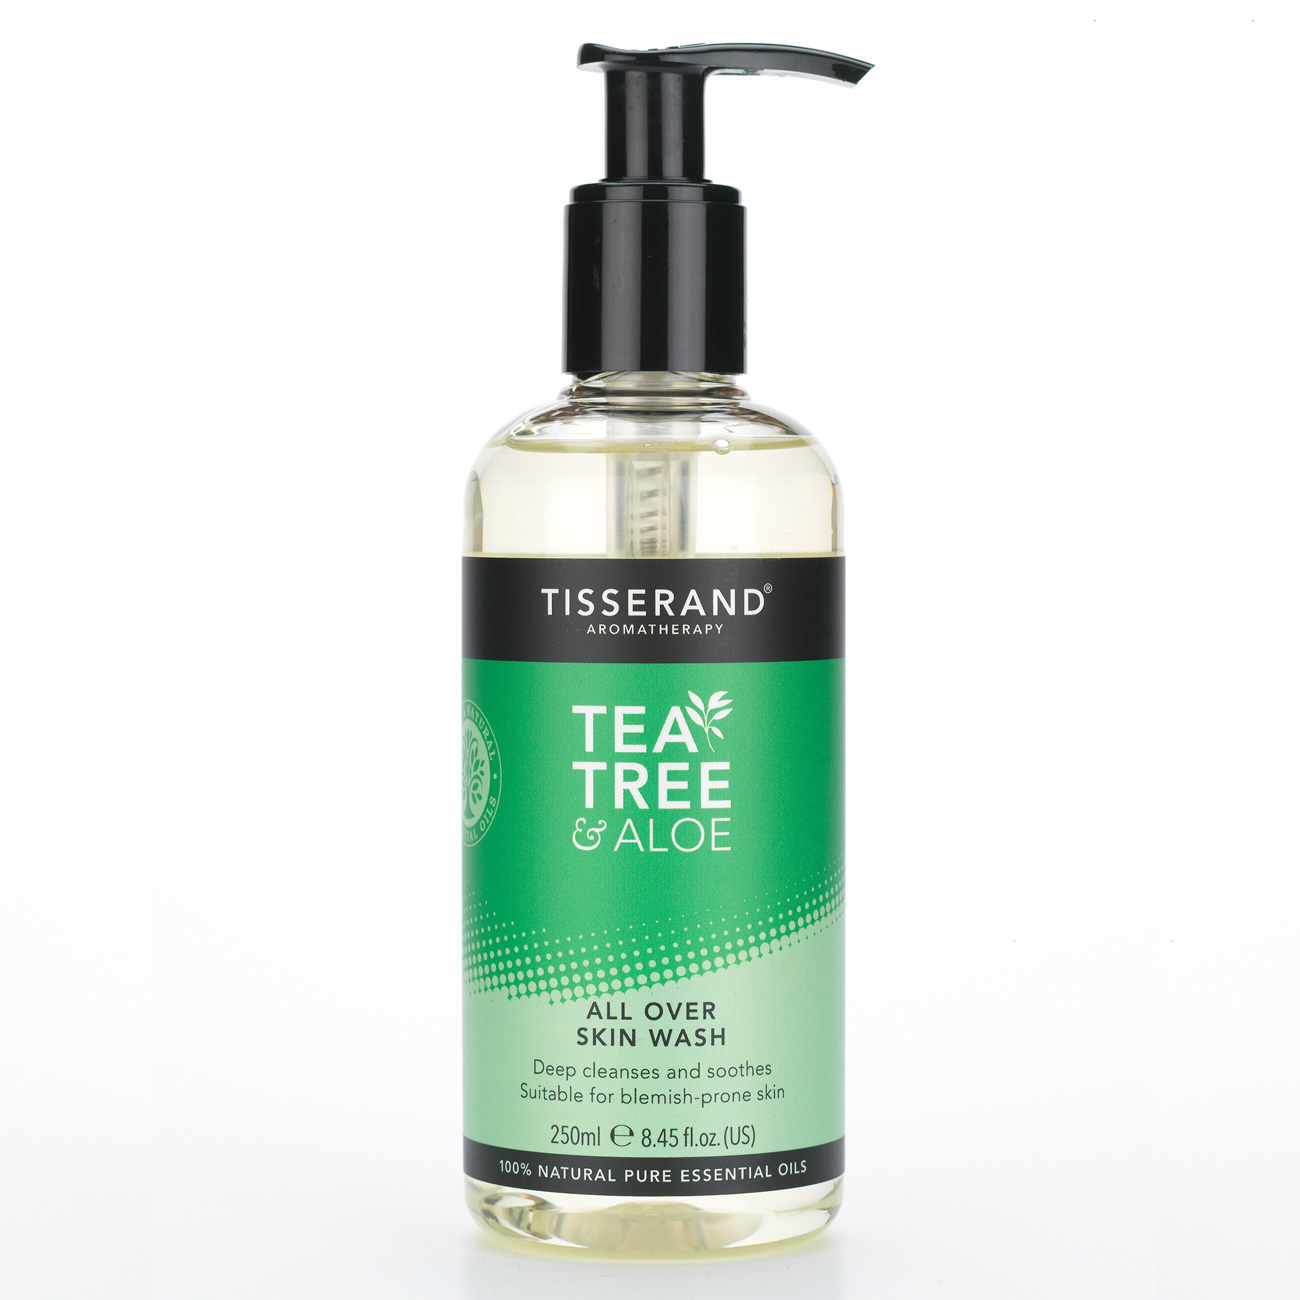 Tisserand  Tea Tree & Aloe All Over Skin Wash